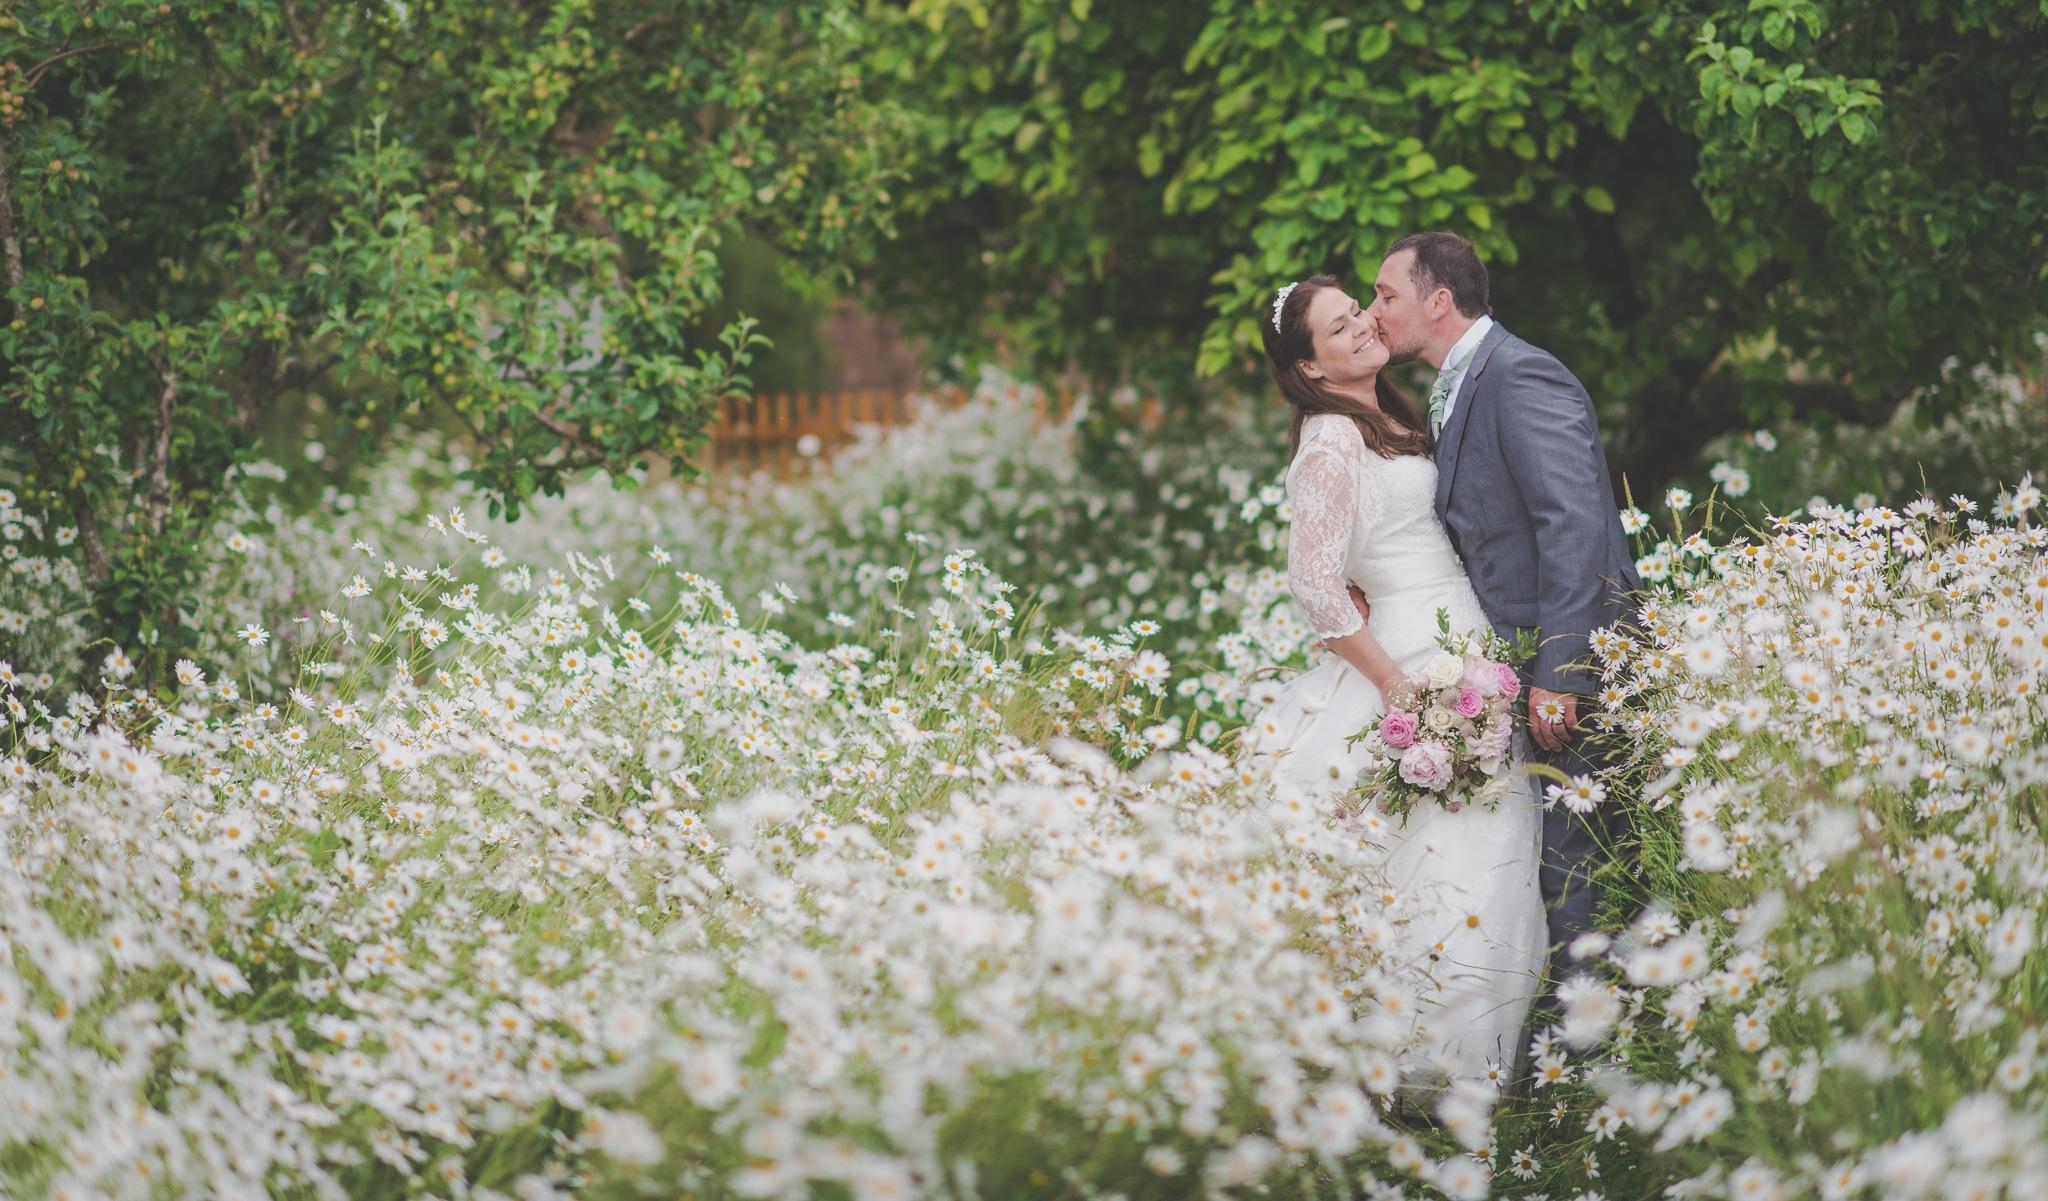 Wedding-Photographer-Wimborne-Deans-Court01